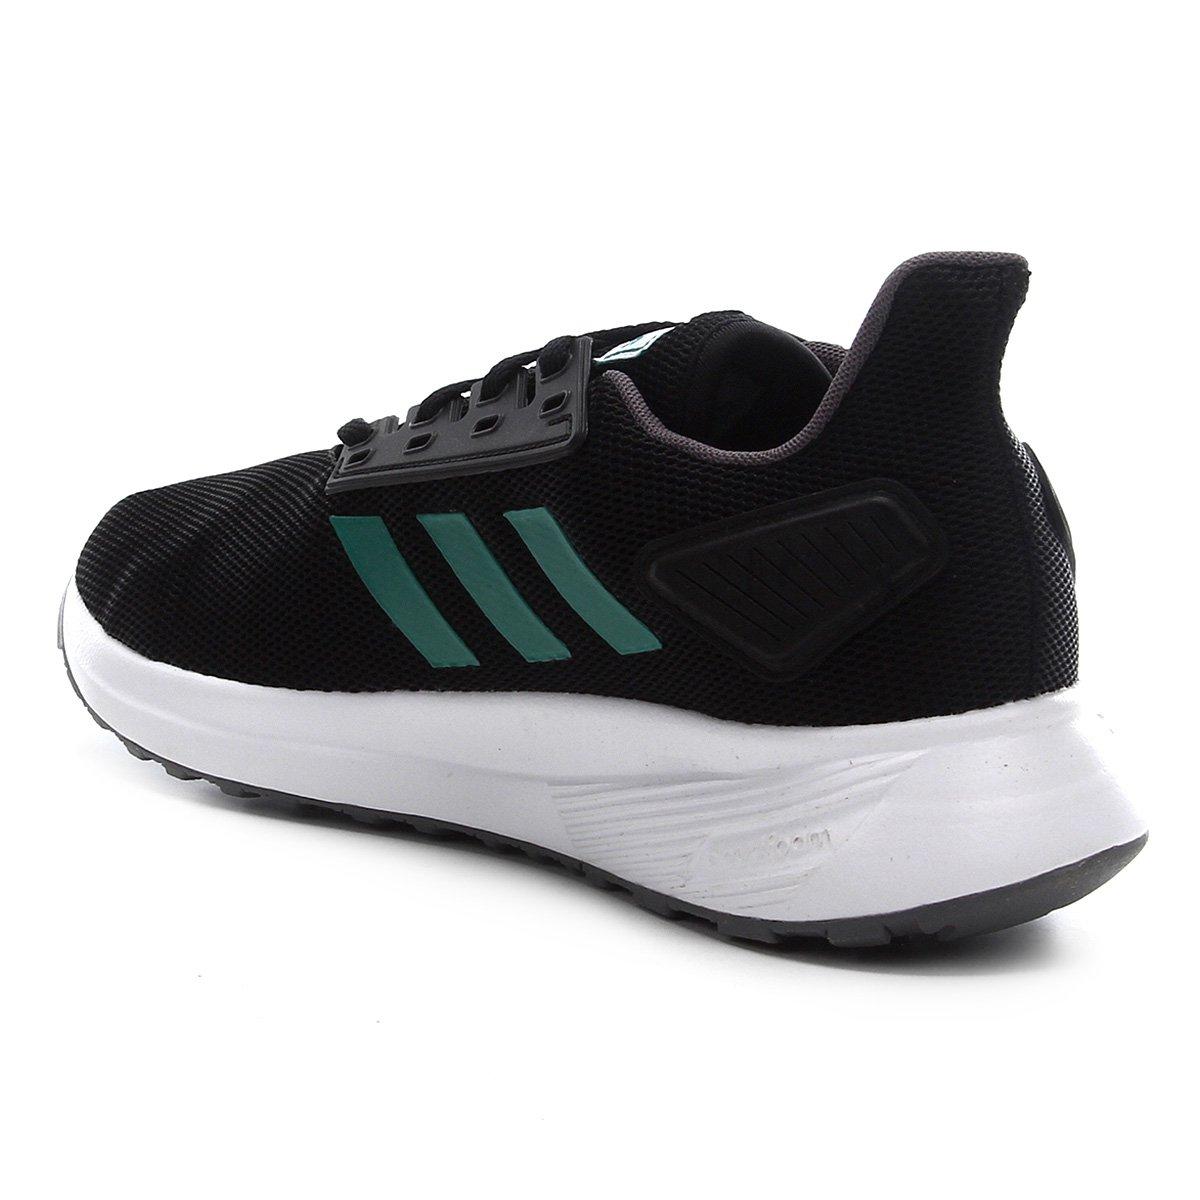 Tênis Adidas Duramo 9 Masculino - Tam: 44 - 1